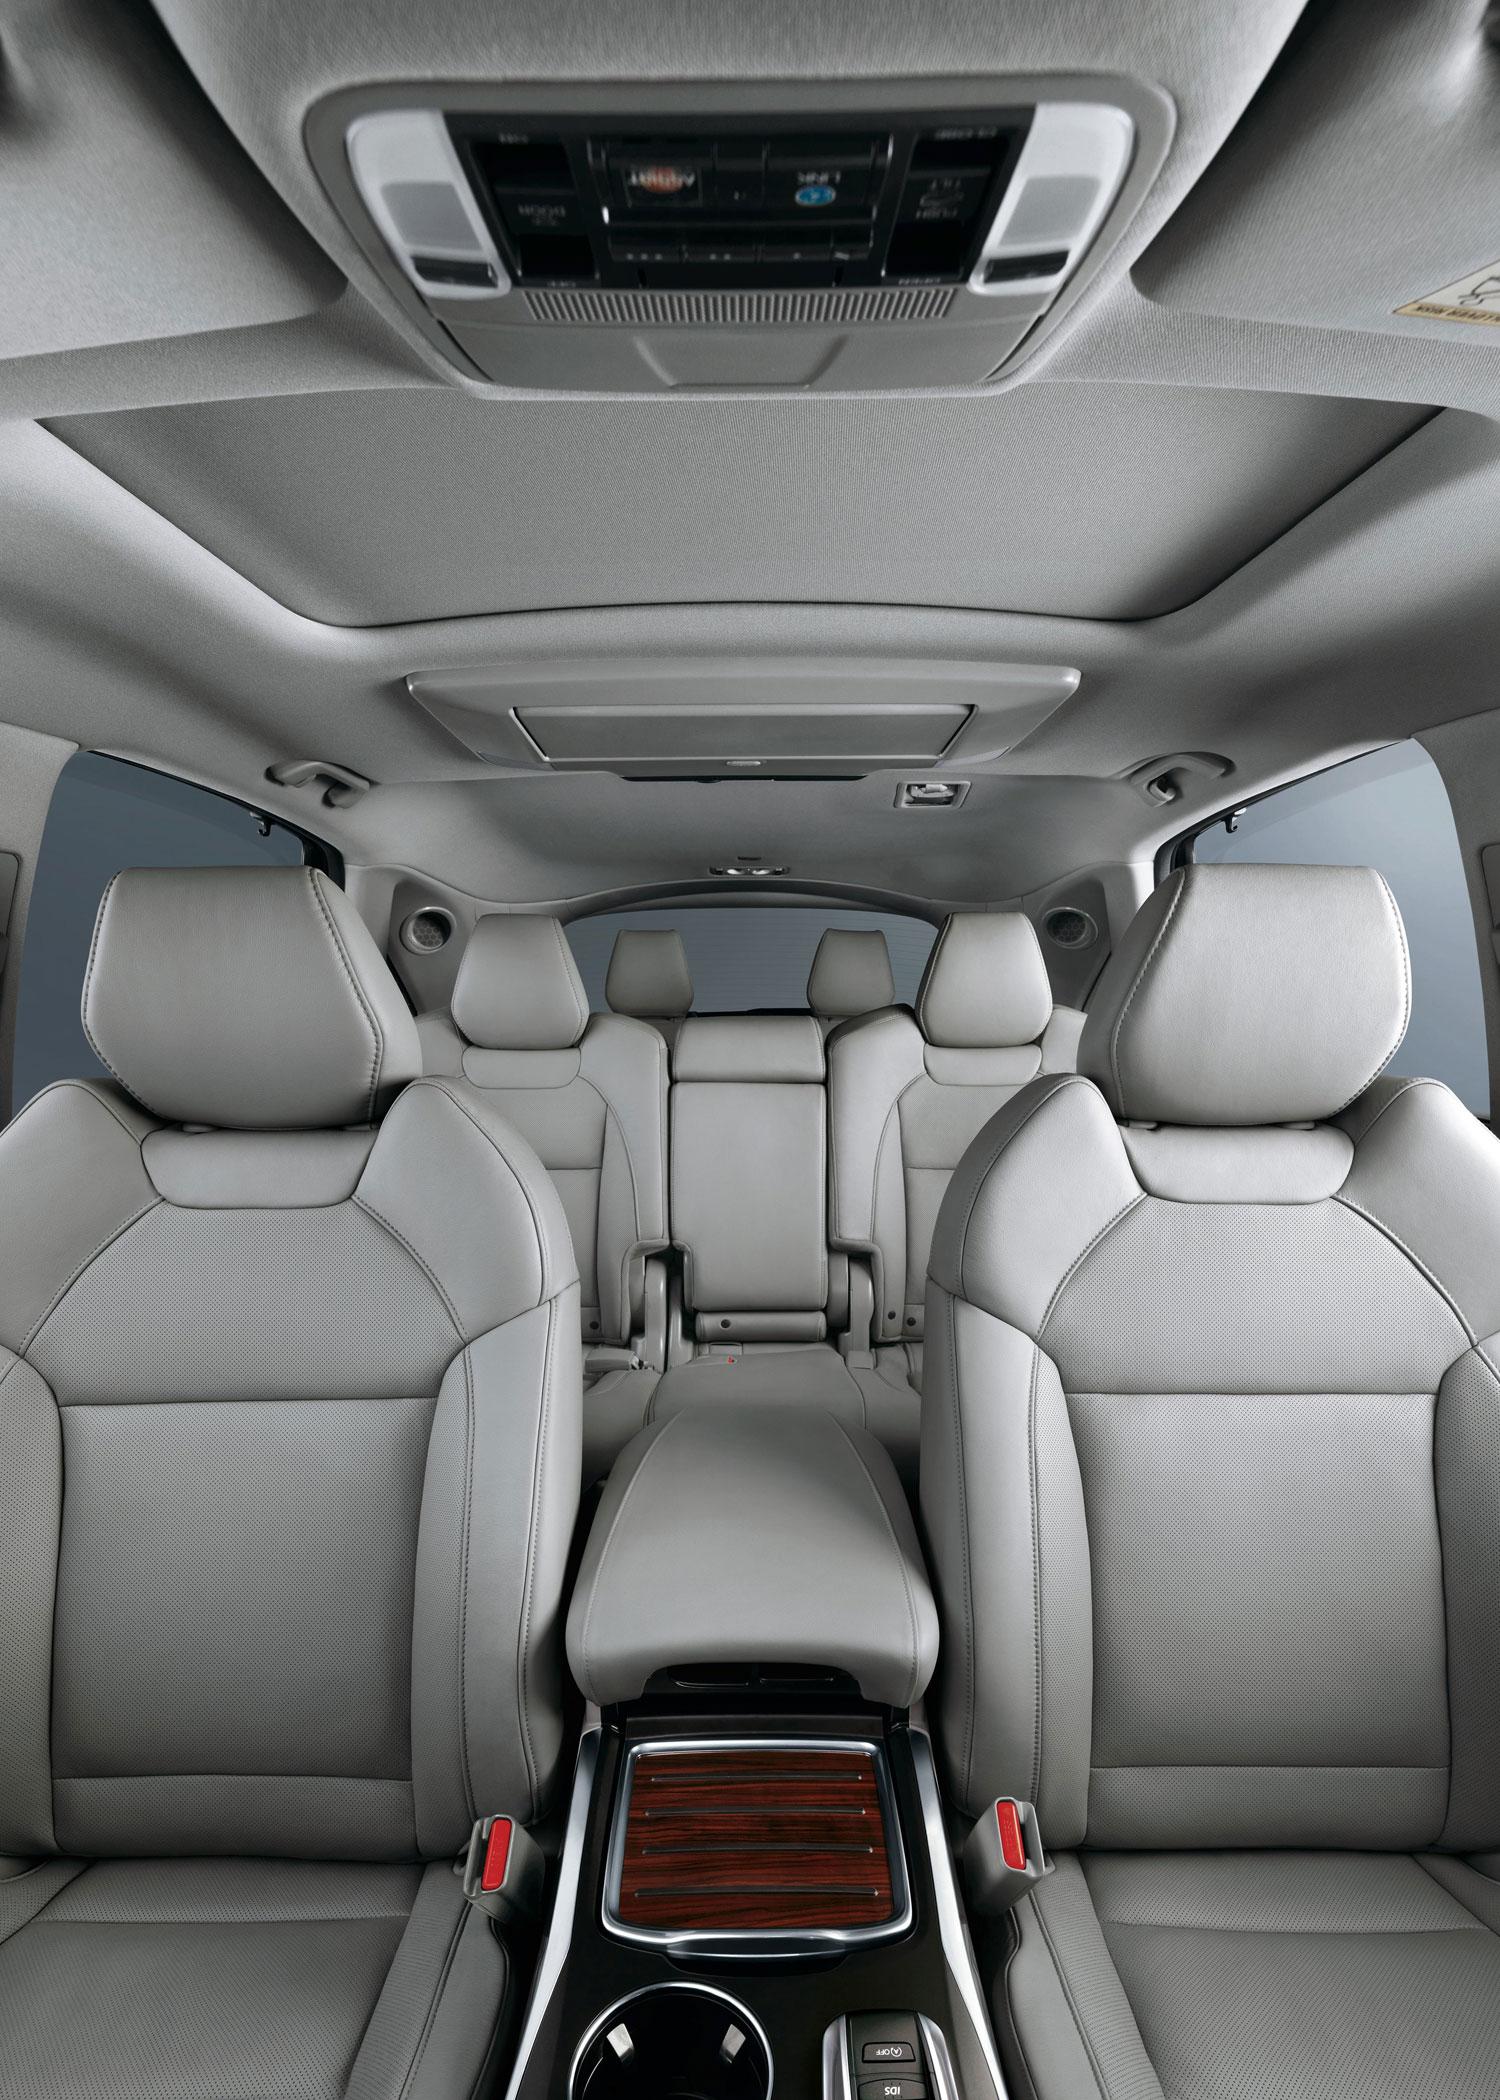 2016 Acura Mdx Seats 38 121